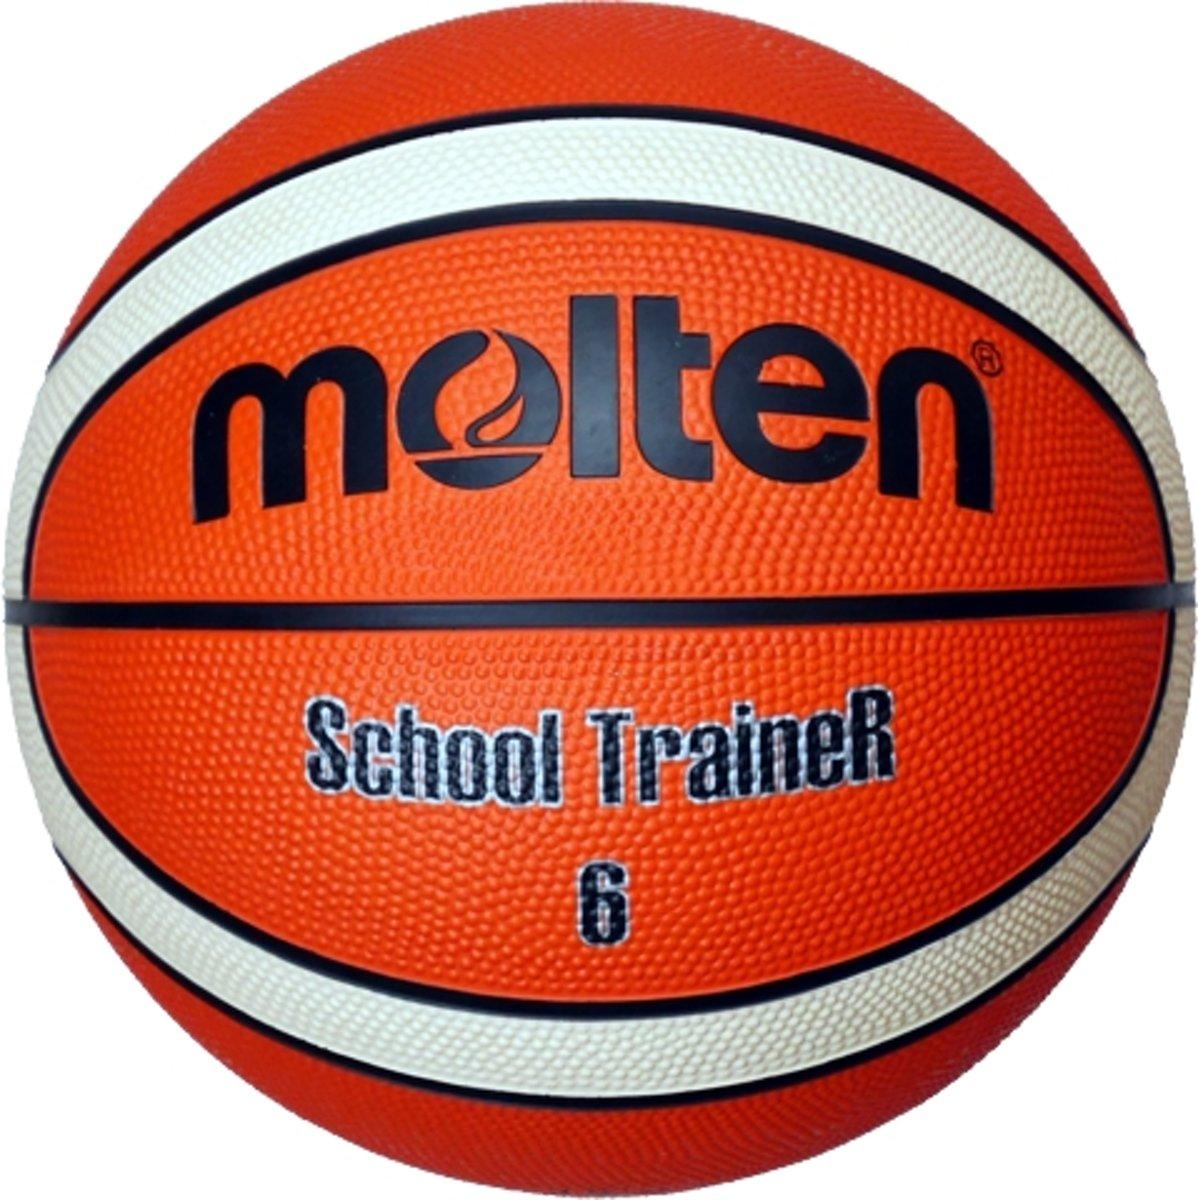 Molten Basketbal BG6-ST School Trainer kopen